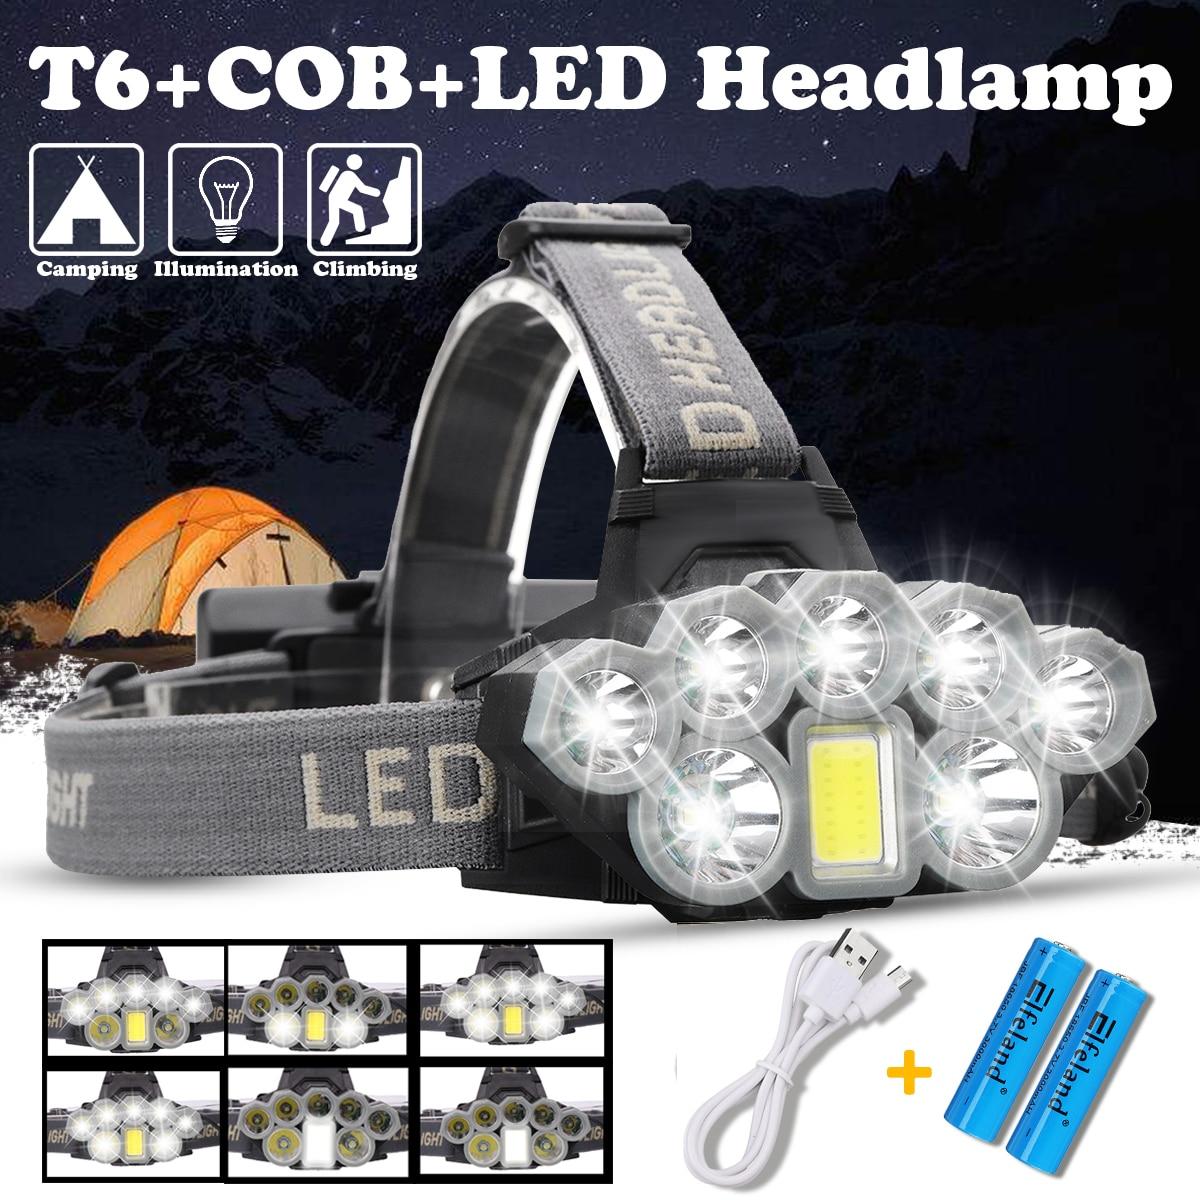 Lights & Lighting The Best Trustfire 18650 Led Headlamp Powerful Lantern Rechargeable Led Head Light Set